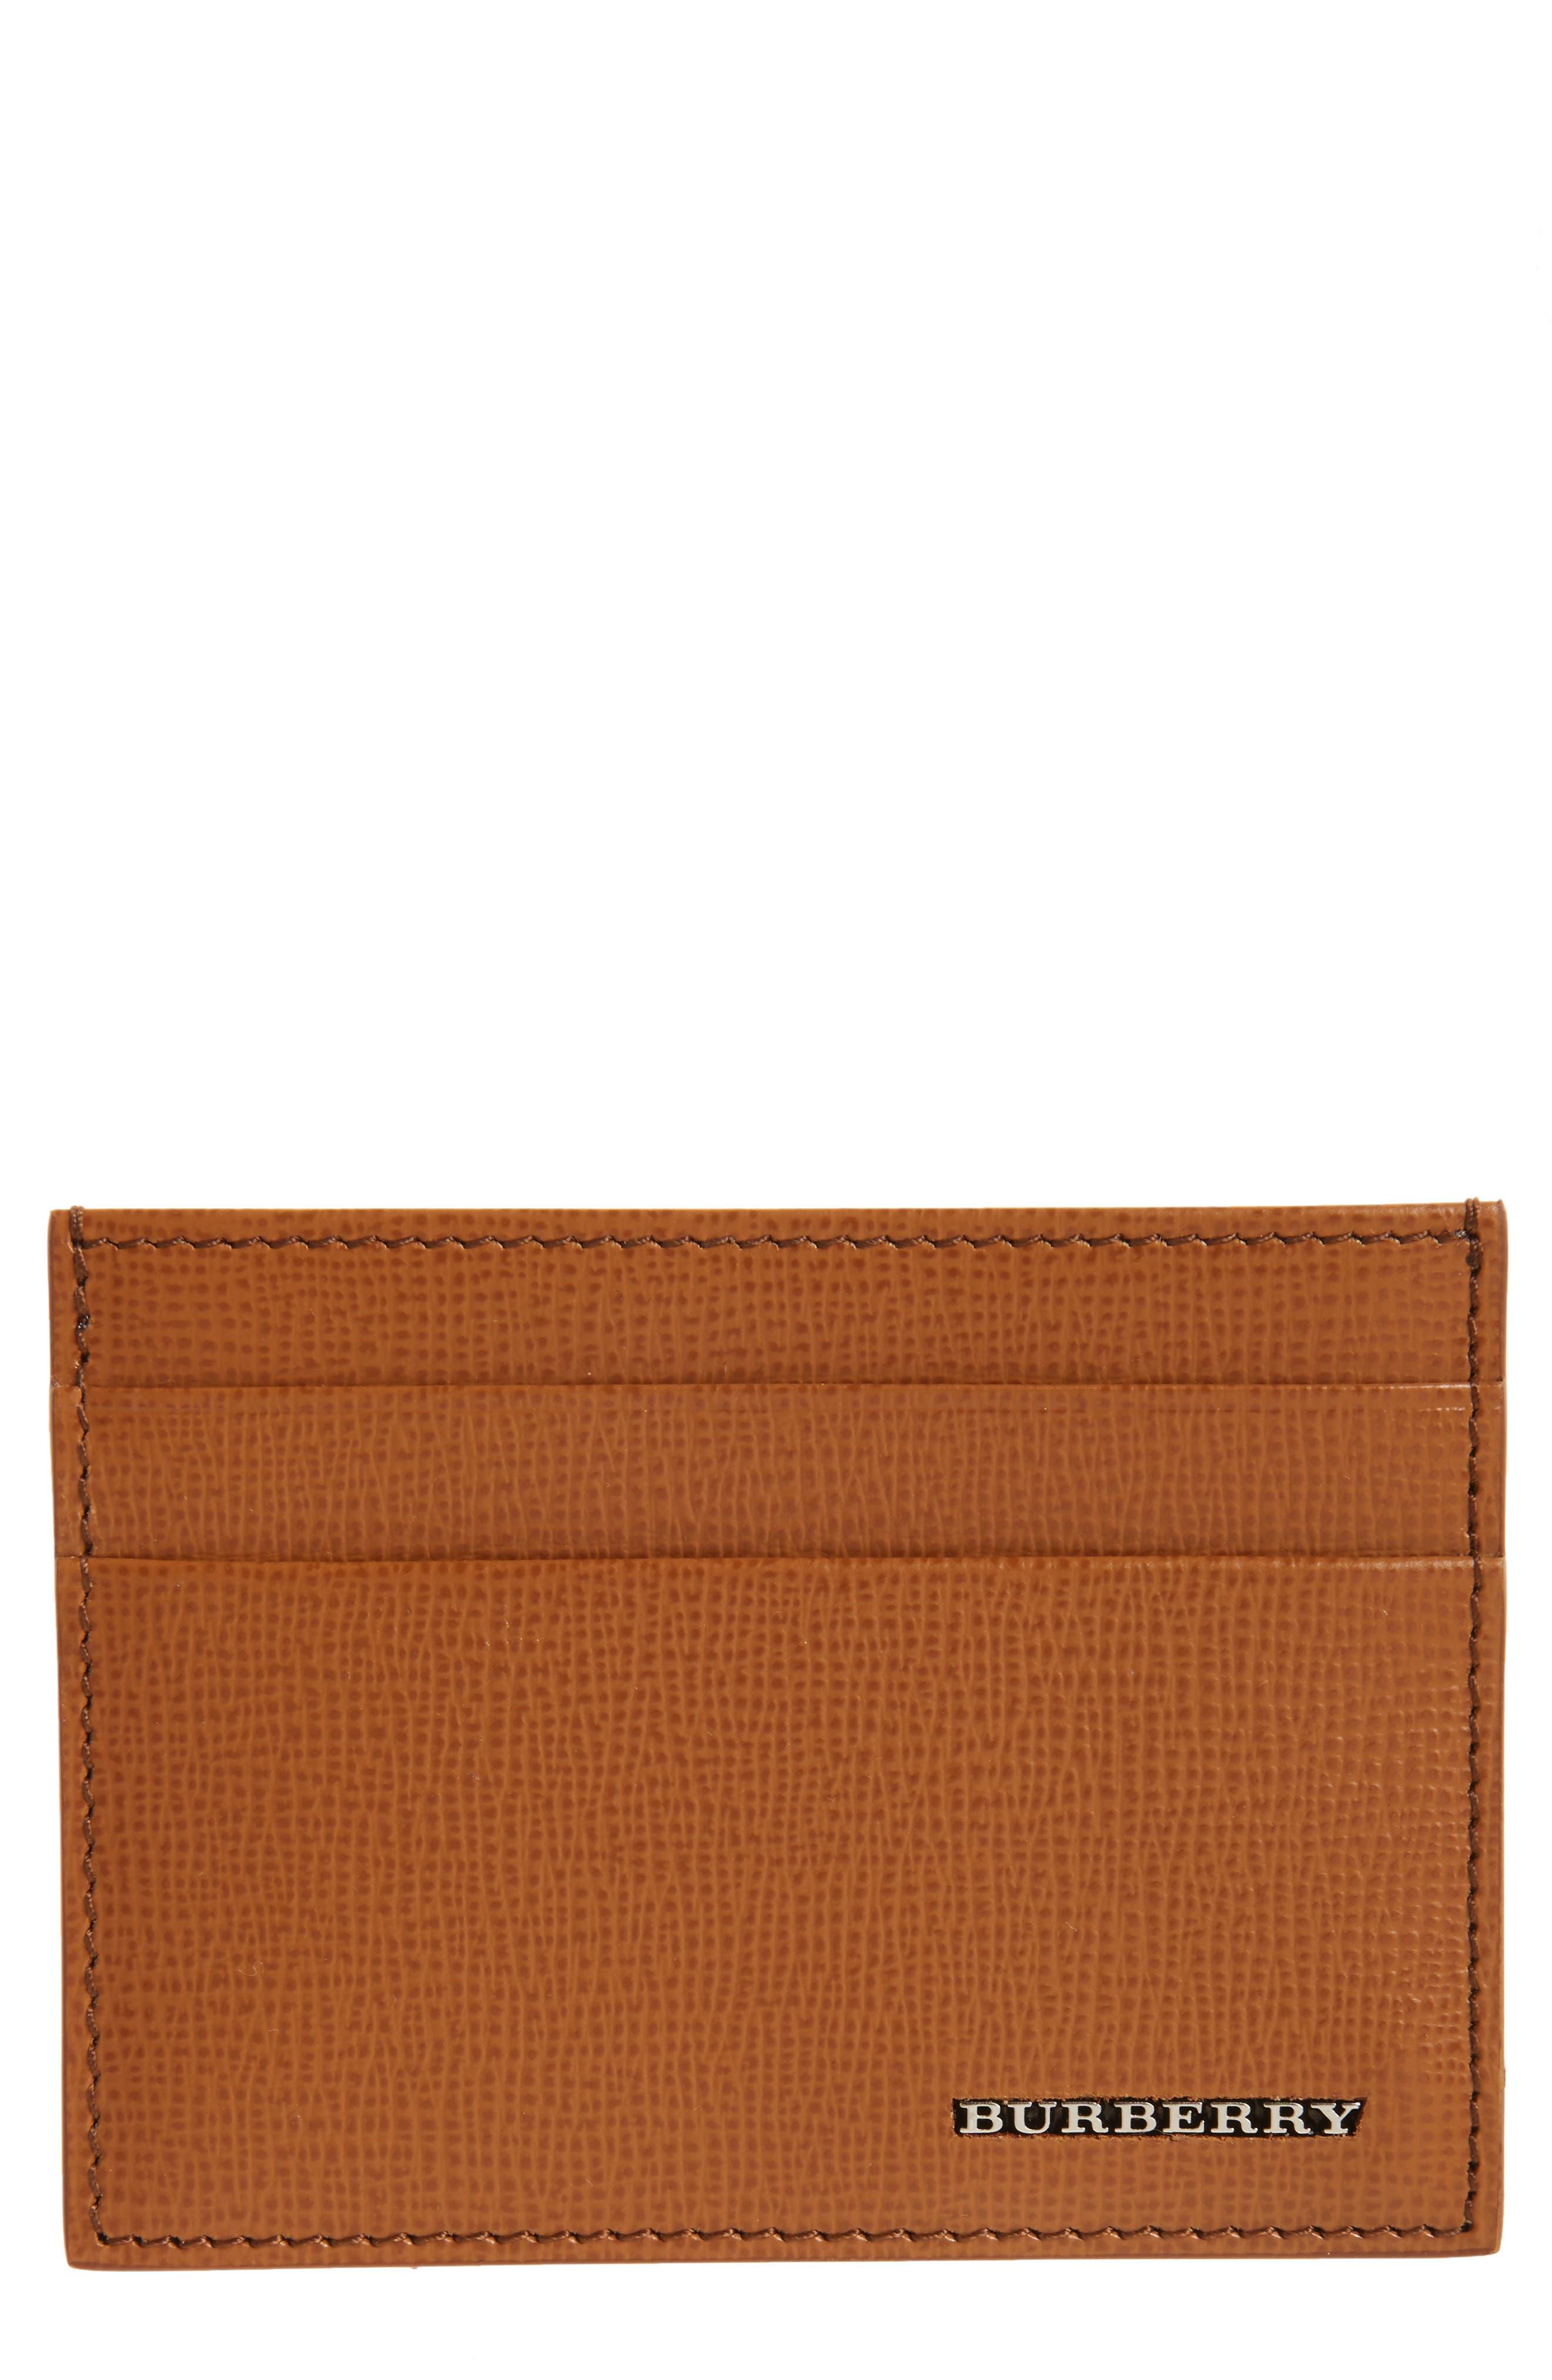 Burberry Sandon Leather Card Case